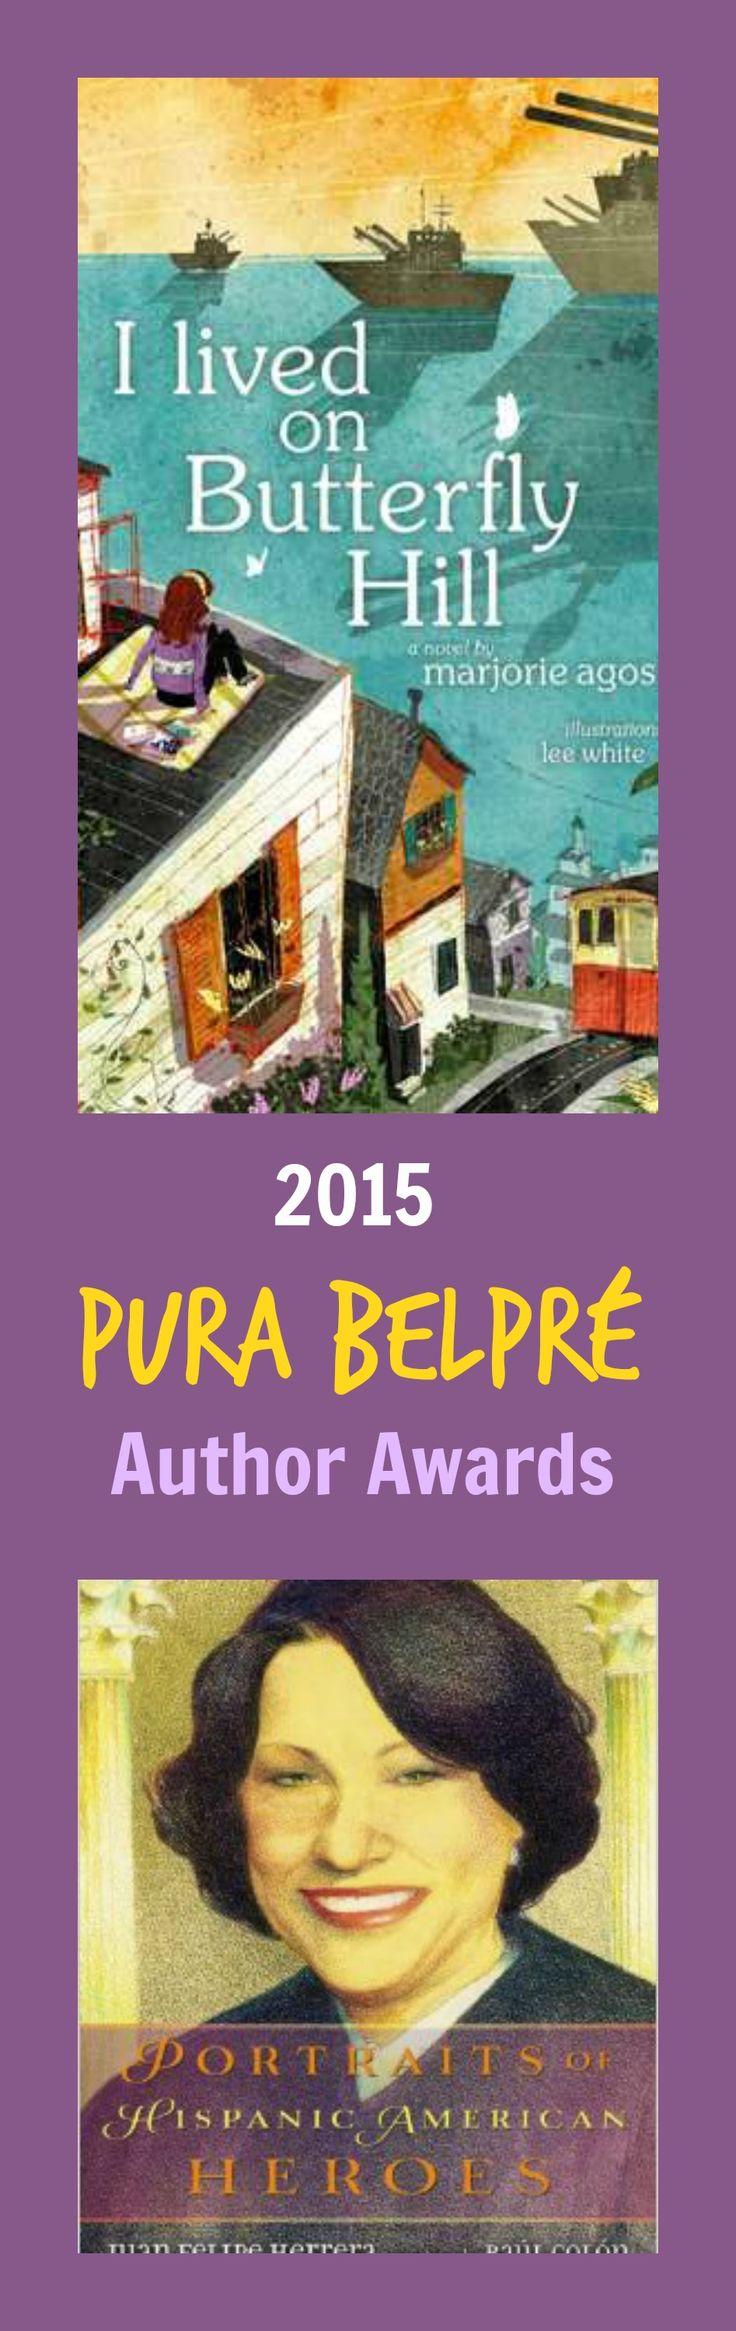 The 2015 Pura Belpr� Award Winner And Honor Book